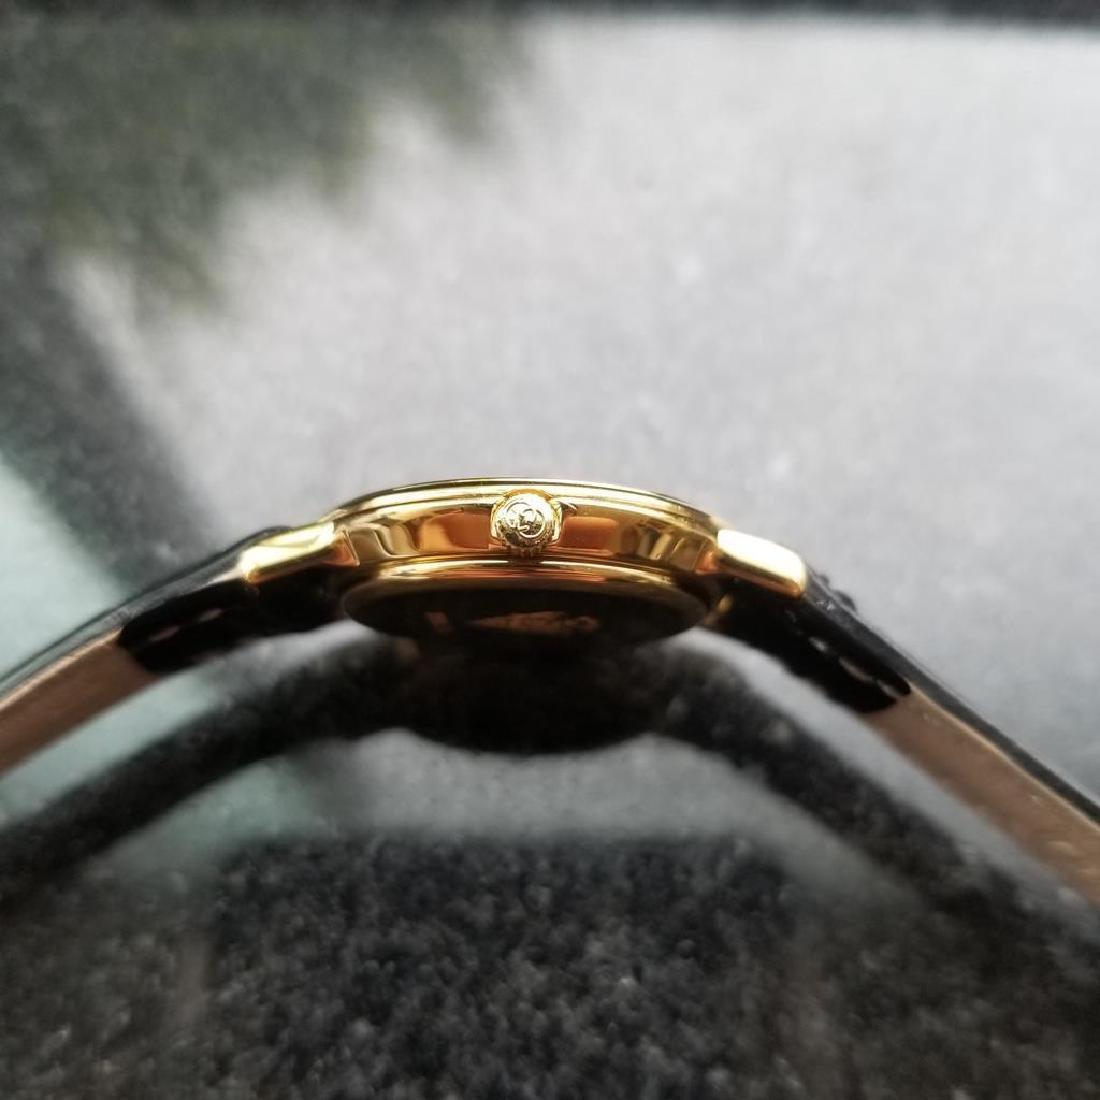 GUCCI Ladies Gold-Plated 3000.2.L Lux Swiss Dress Watch - 6